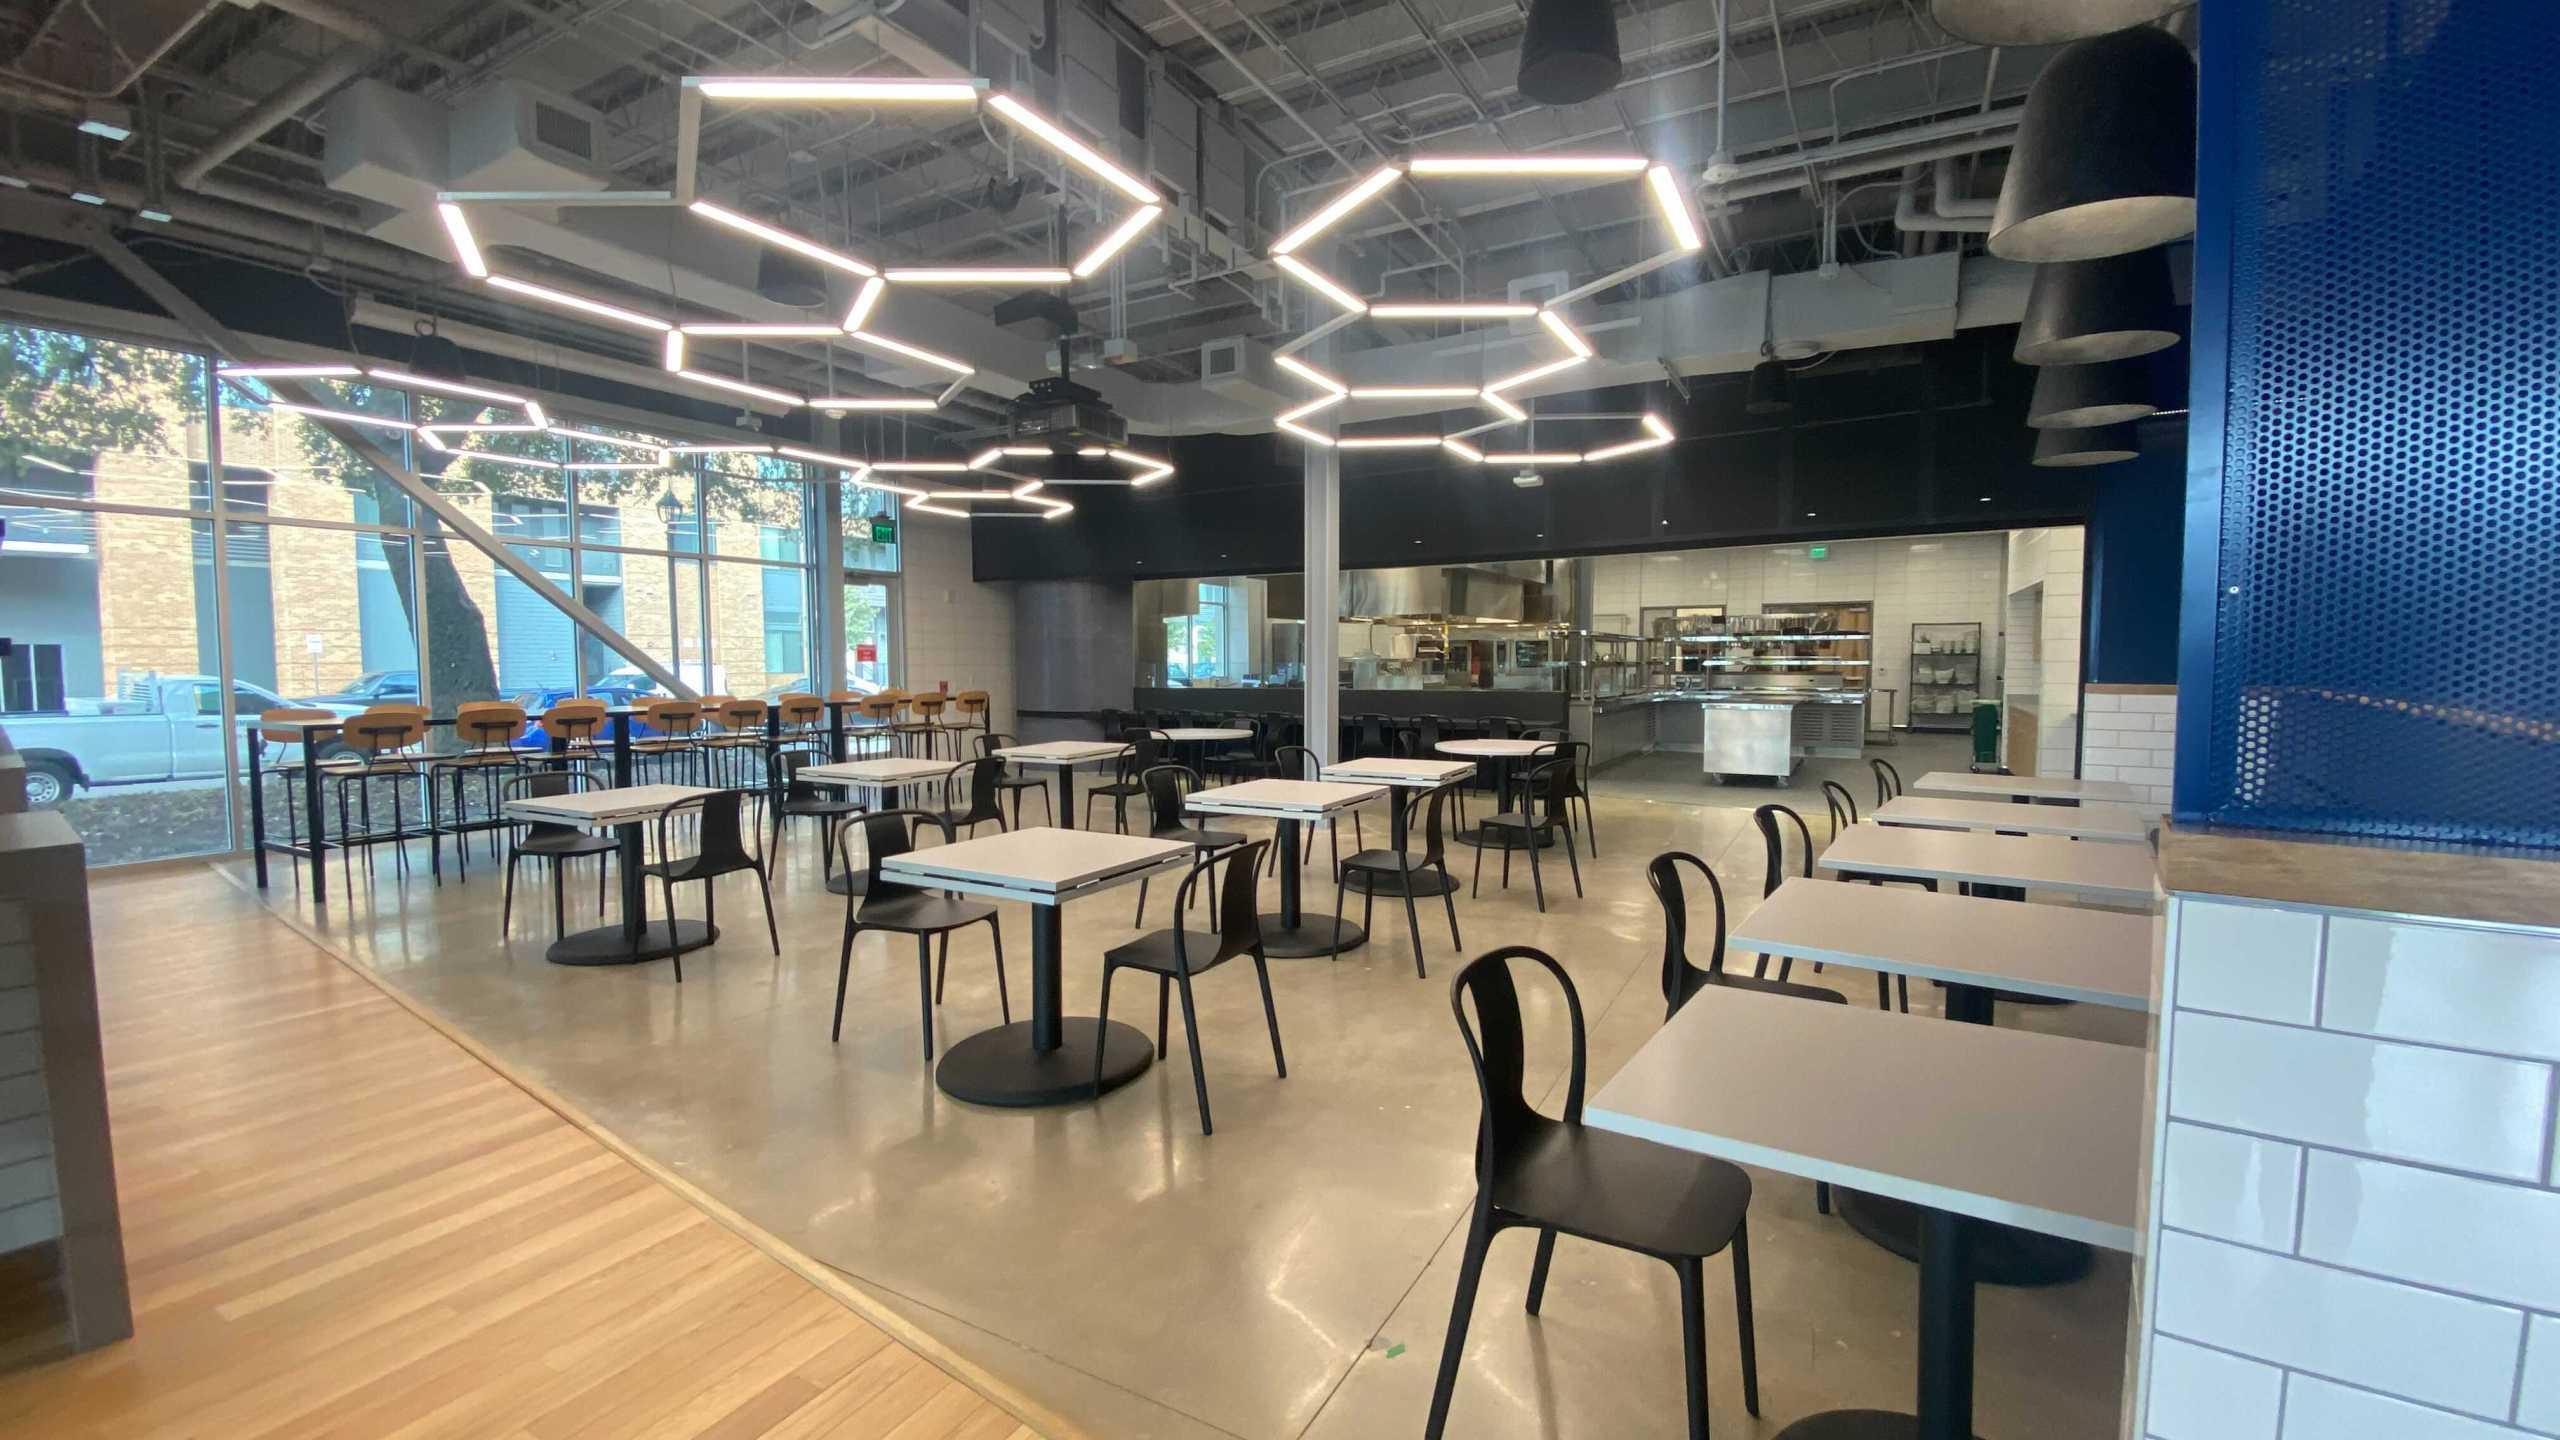 Austin Community College's new Highland campus (KXAN/Todd Bynum)